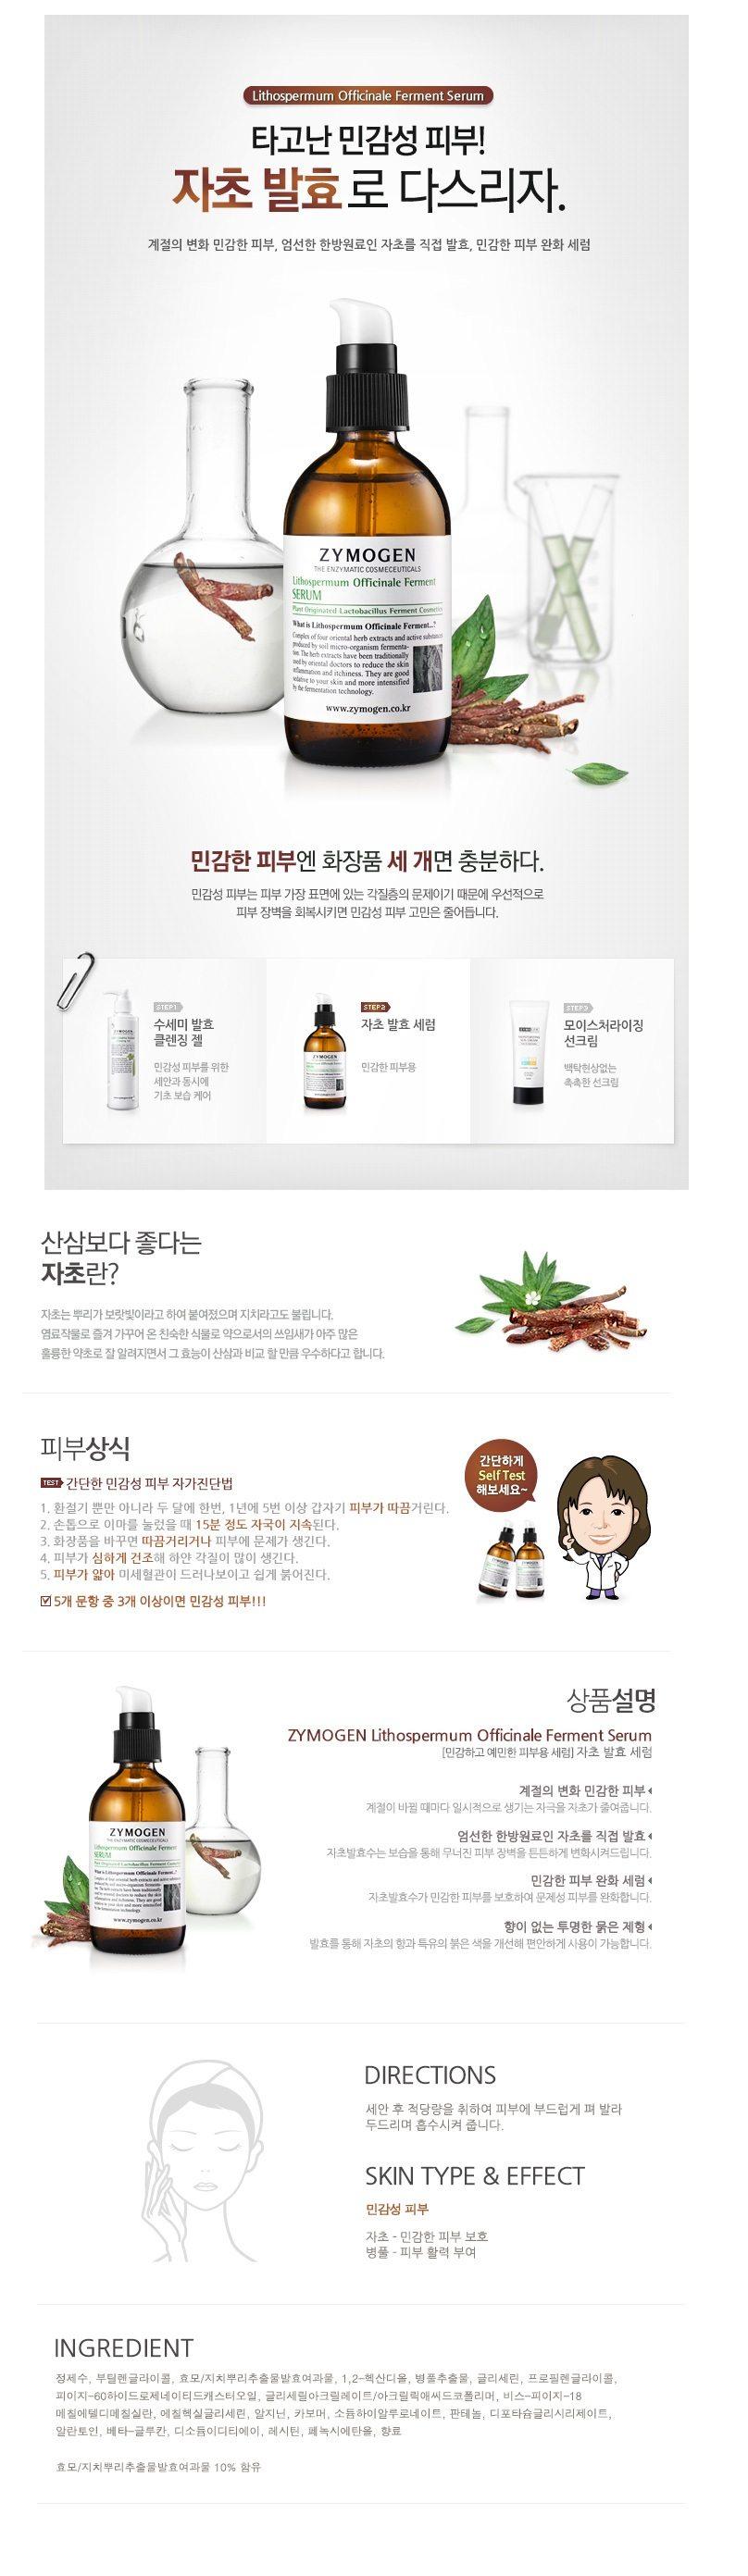 Zymogen Lithospermum Officinale Ferment Serum korean cosmetic skincar product online shop malaysia brazil macau1